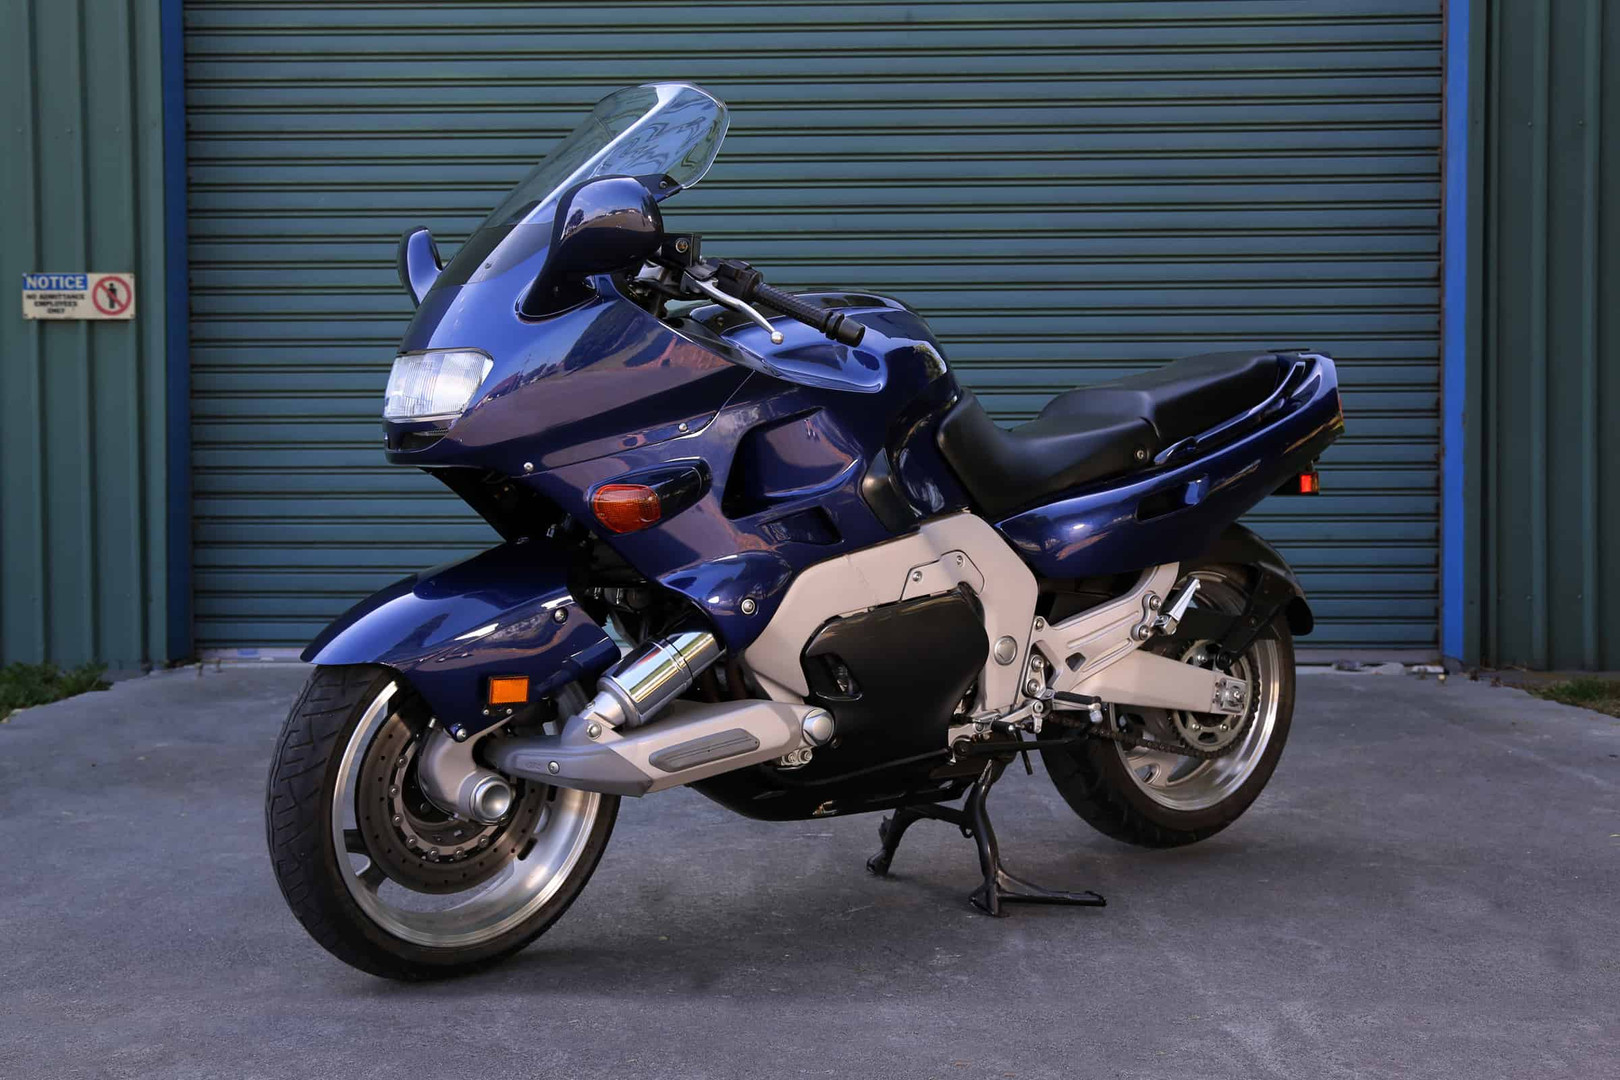 1993-Yamaha-GTS-blue-f45ls.jpg